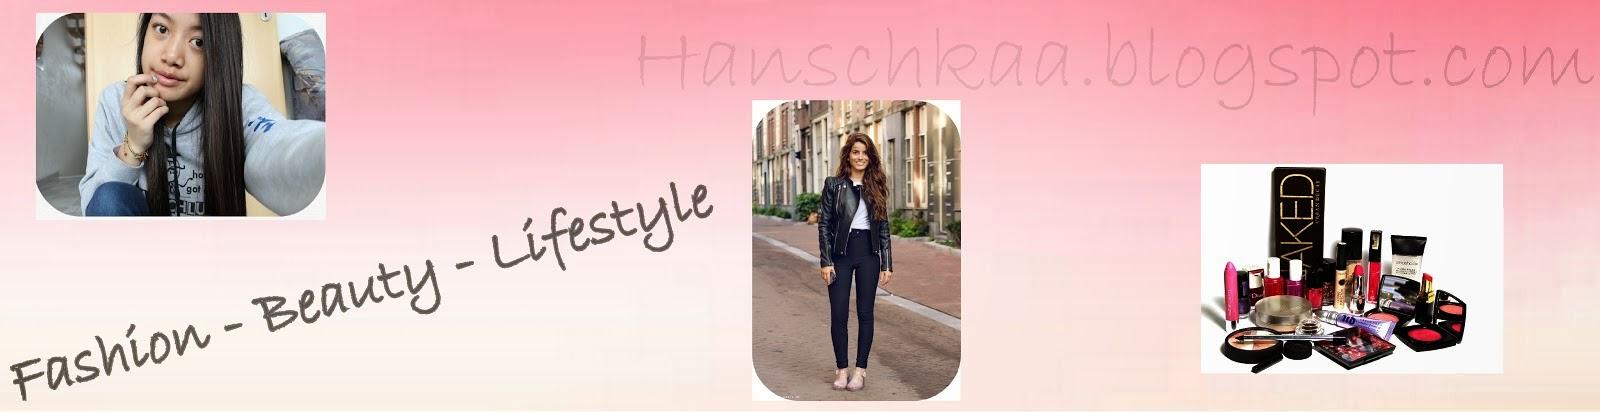 Hanschka - Fashion & Beauty & Lifestyle